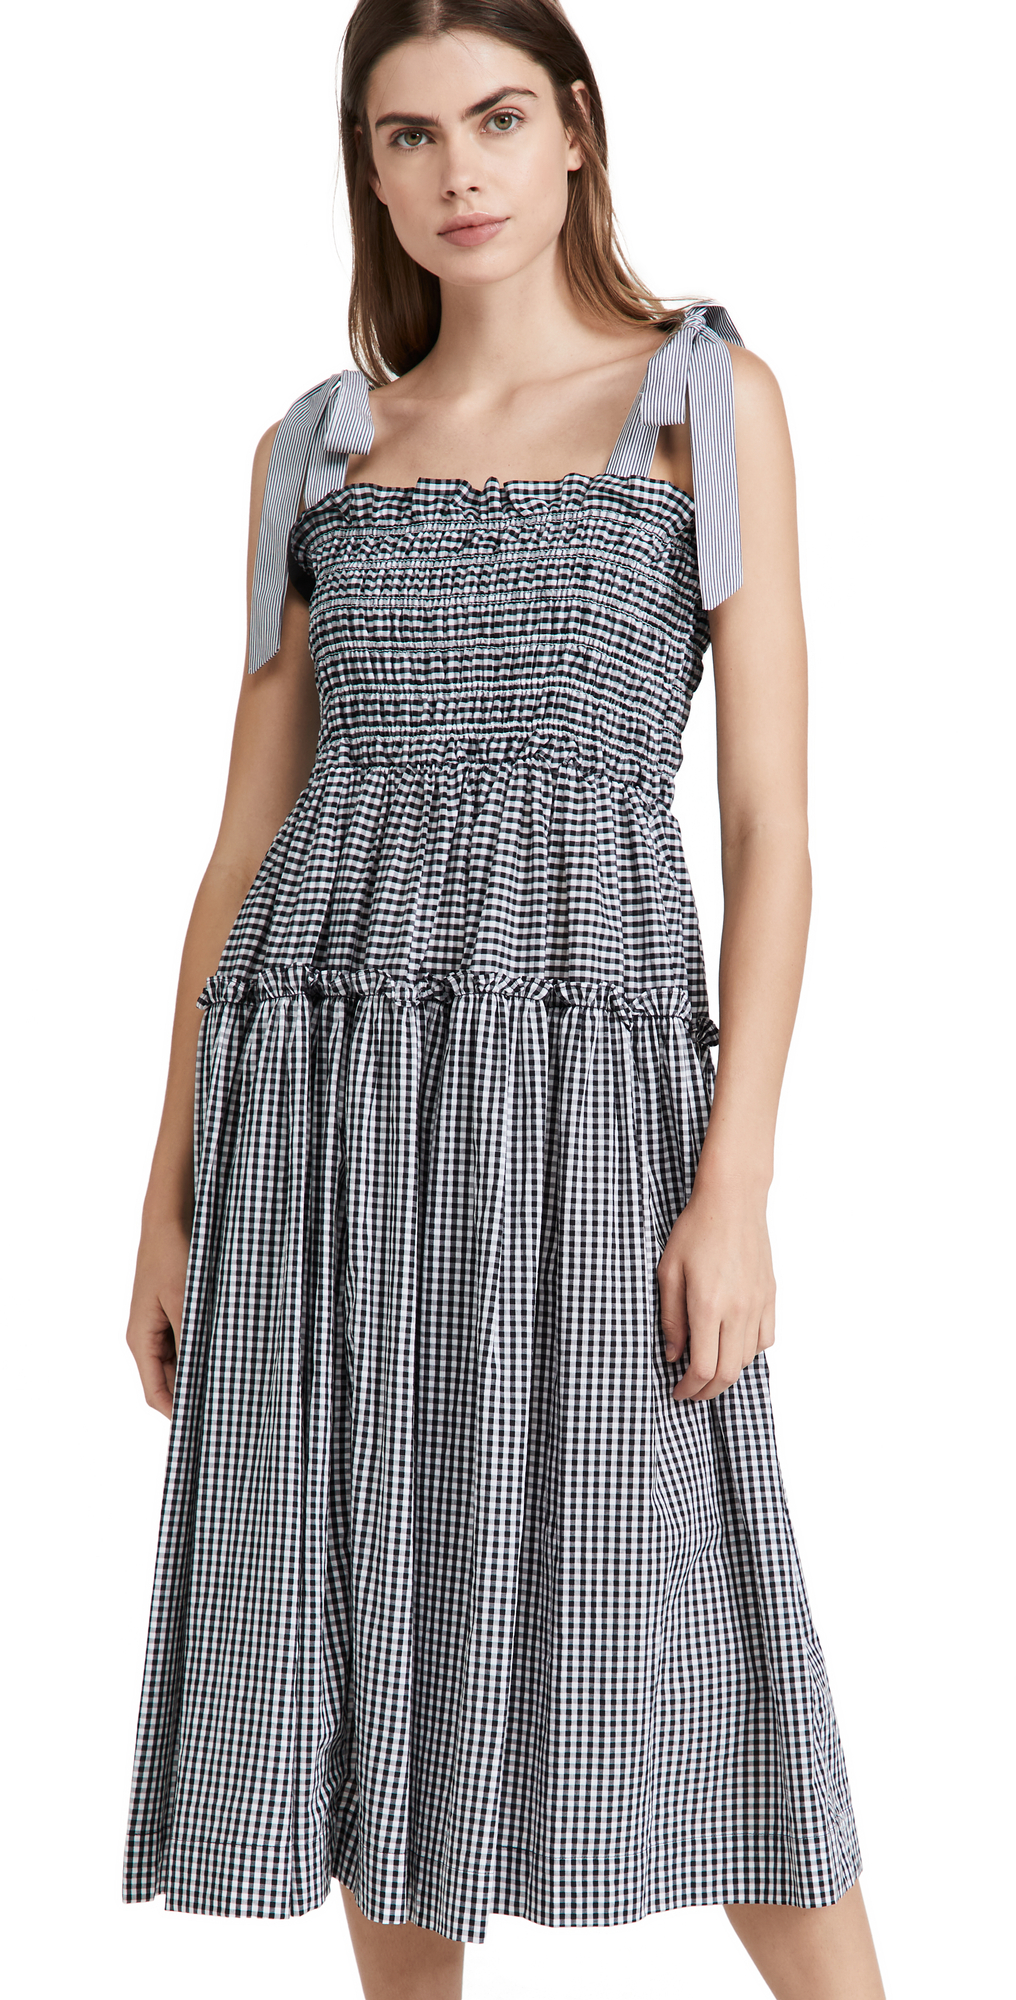 Gingham Smocked Midi Dress